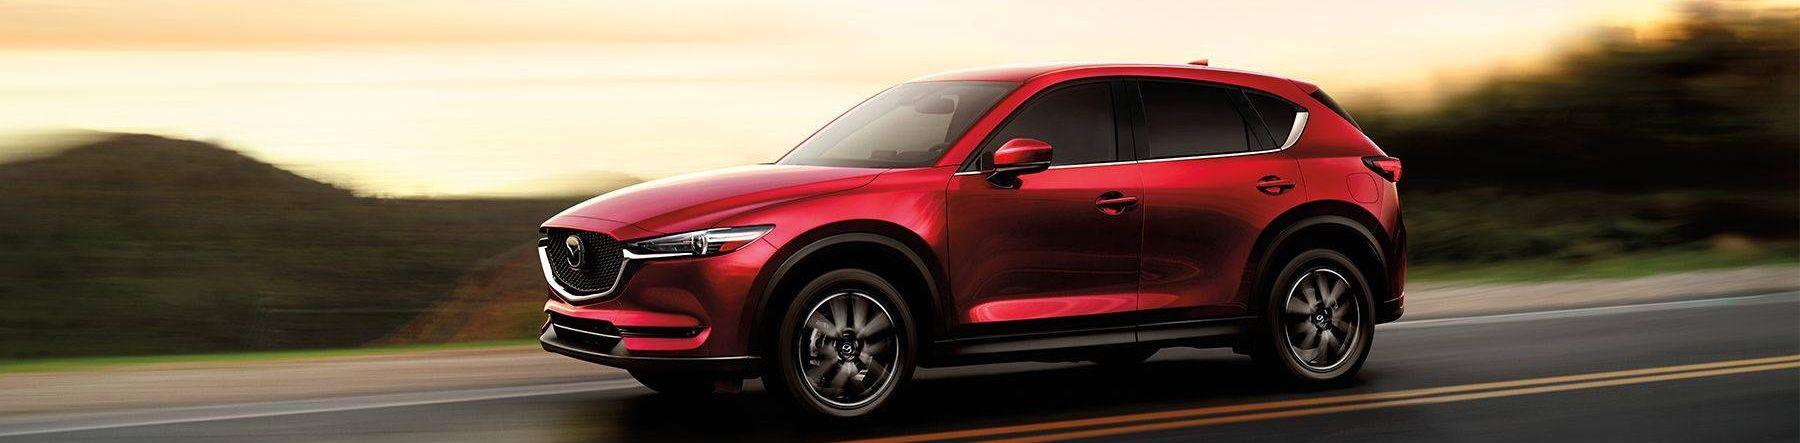 2018 Mazda CX-5 Financing near LaPorte, TX